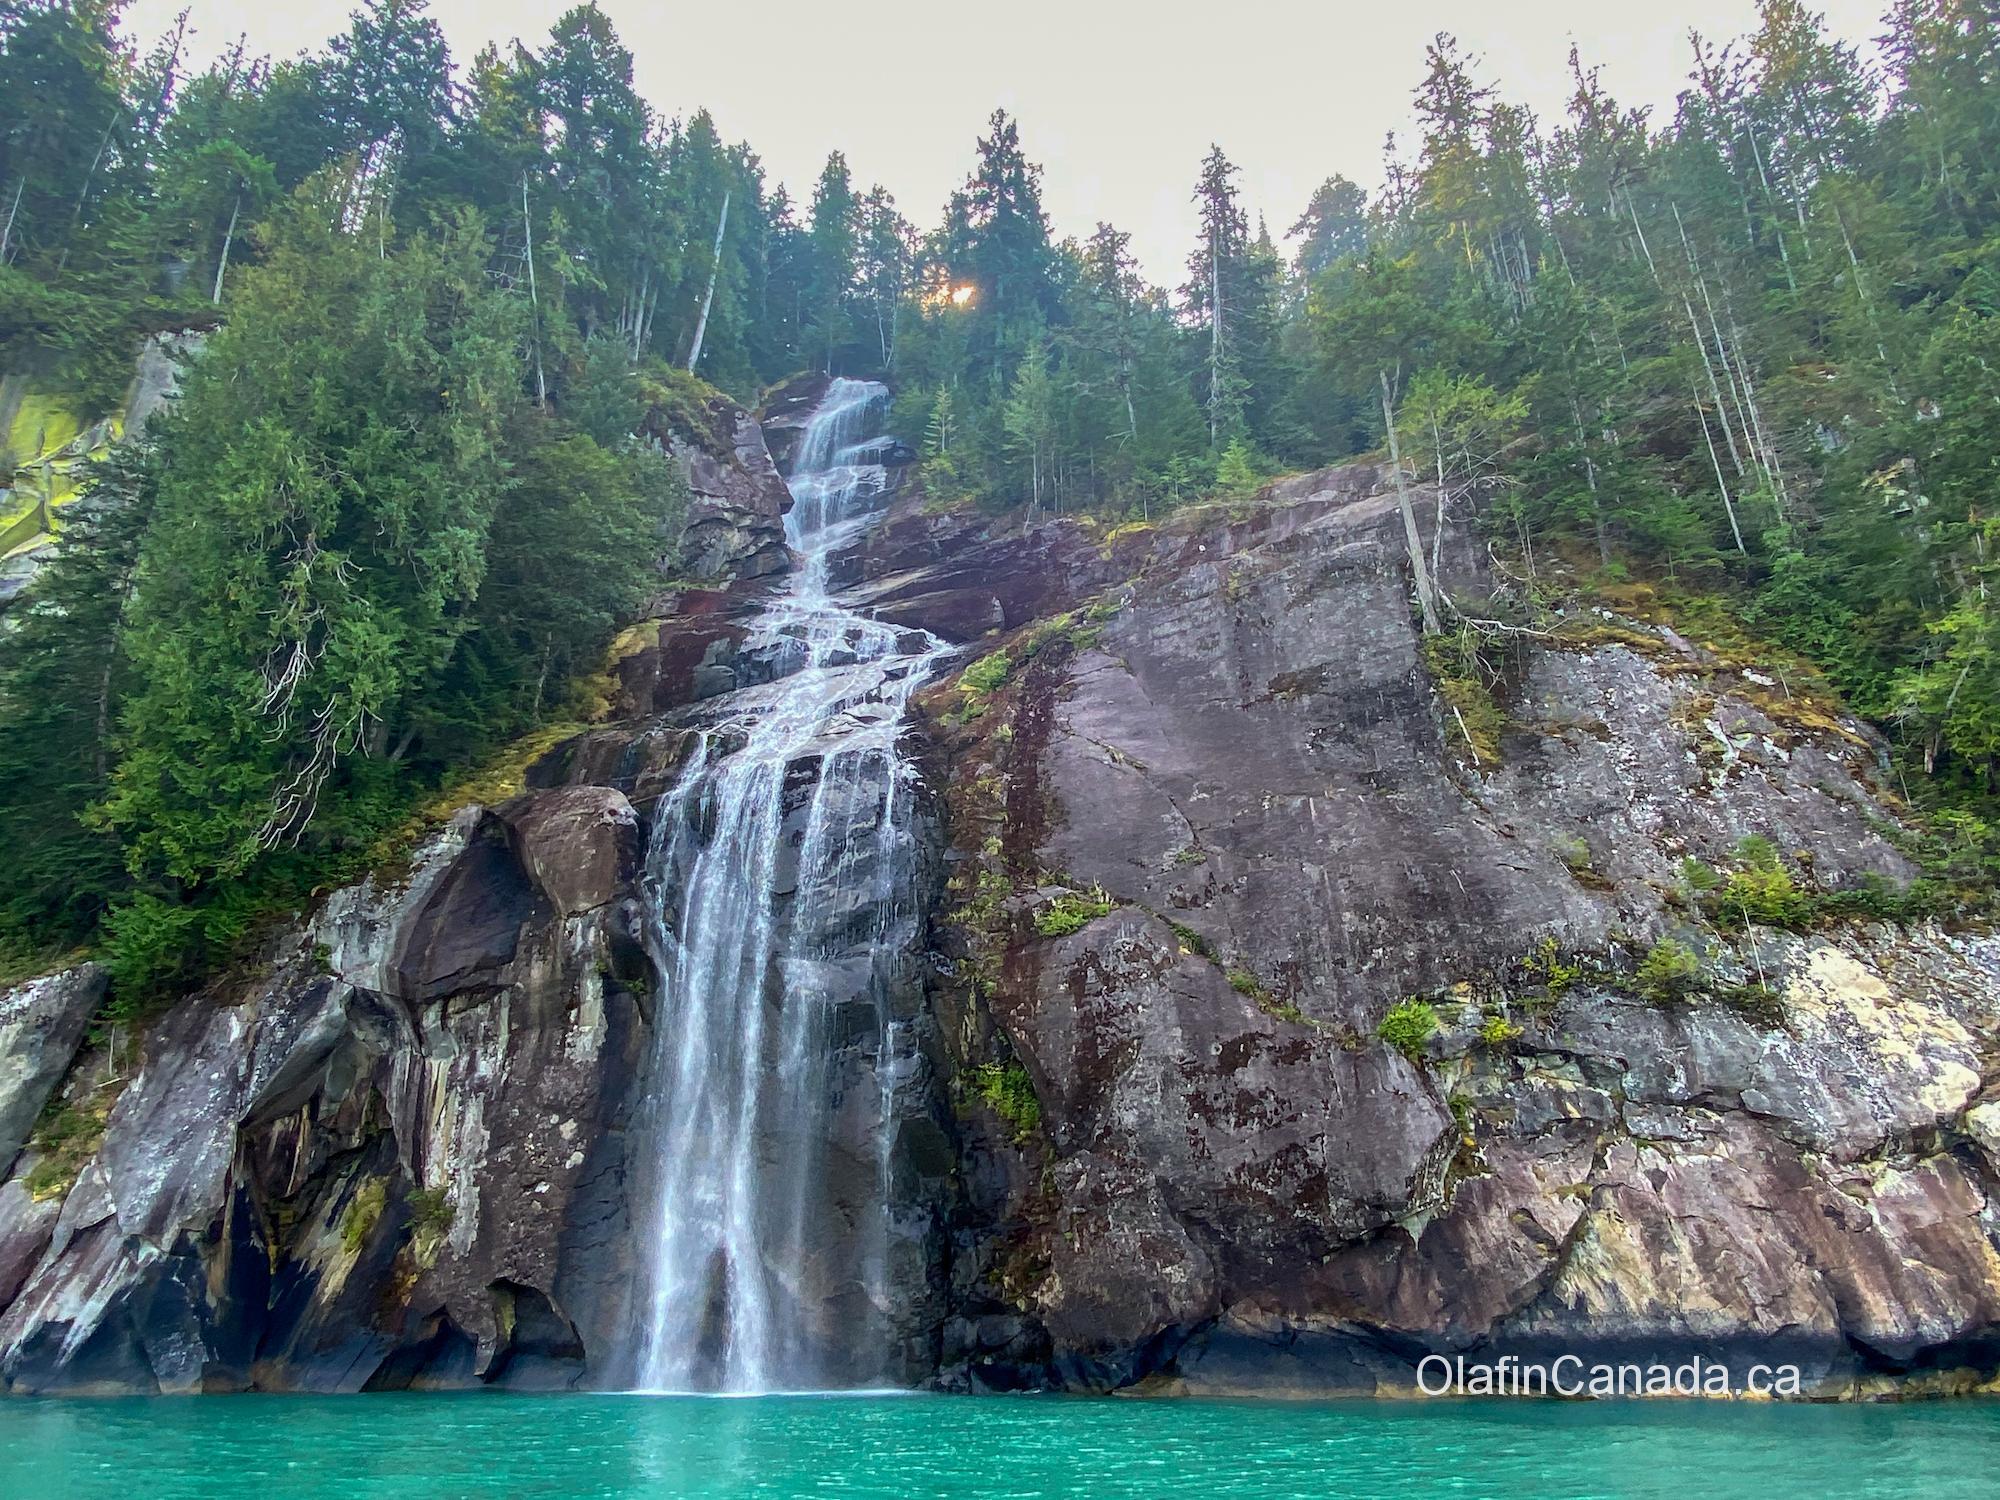 Waterfall near Terrace BC #olafincanada #britishcolumbia #discoverbc #campbellriver #waterfall